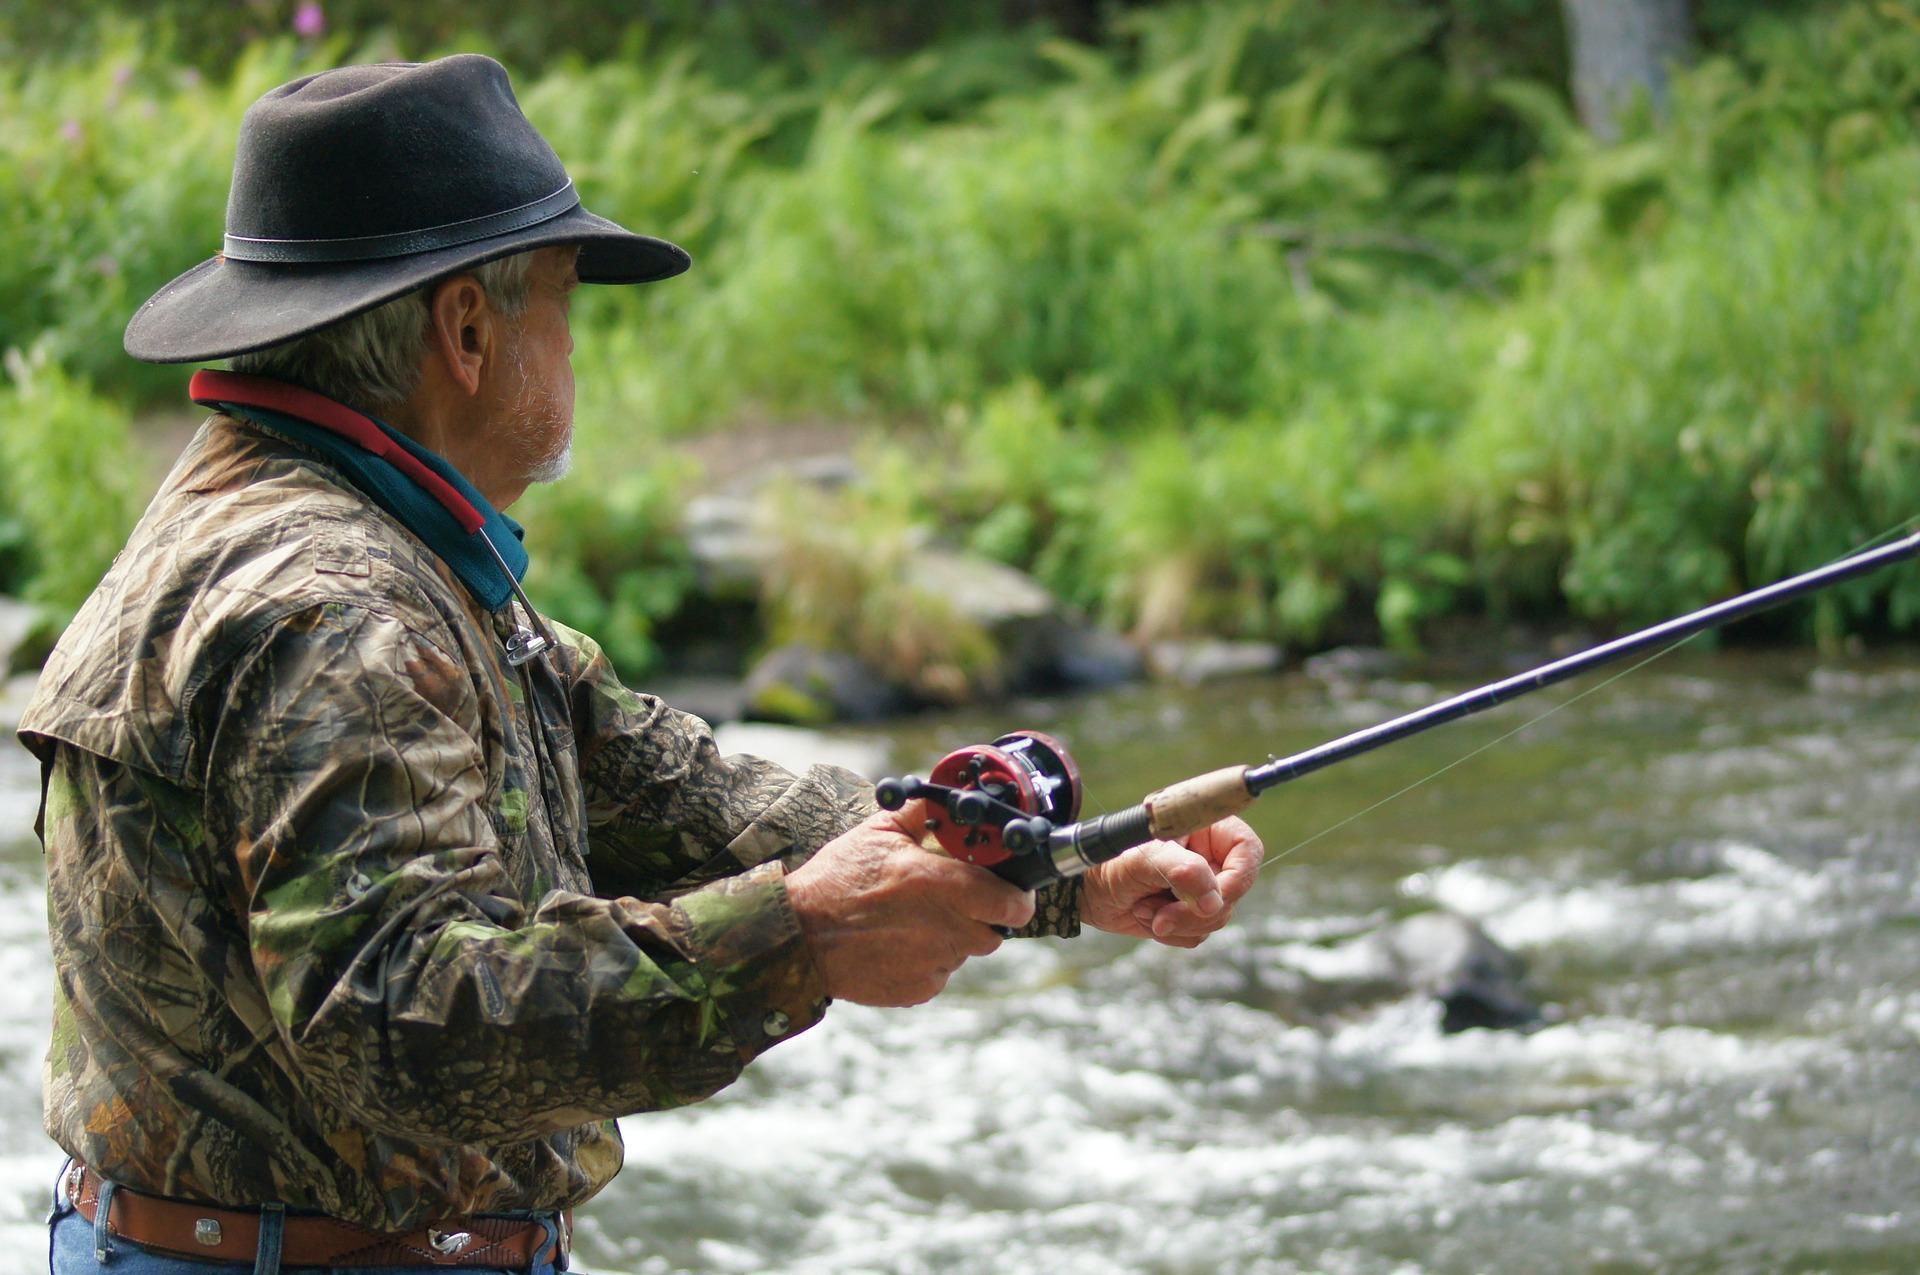 fisherman-585707_1920.jpg